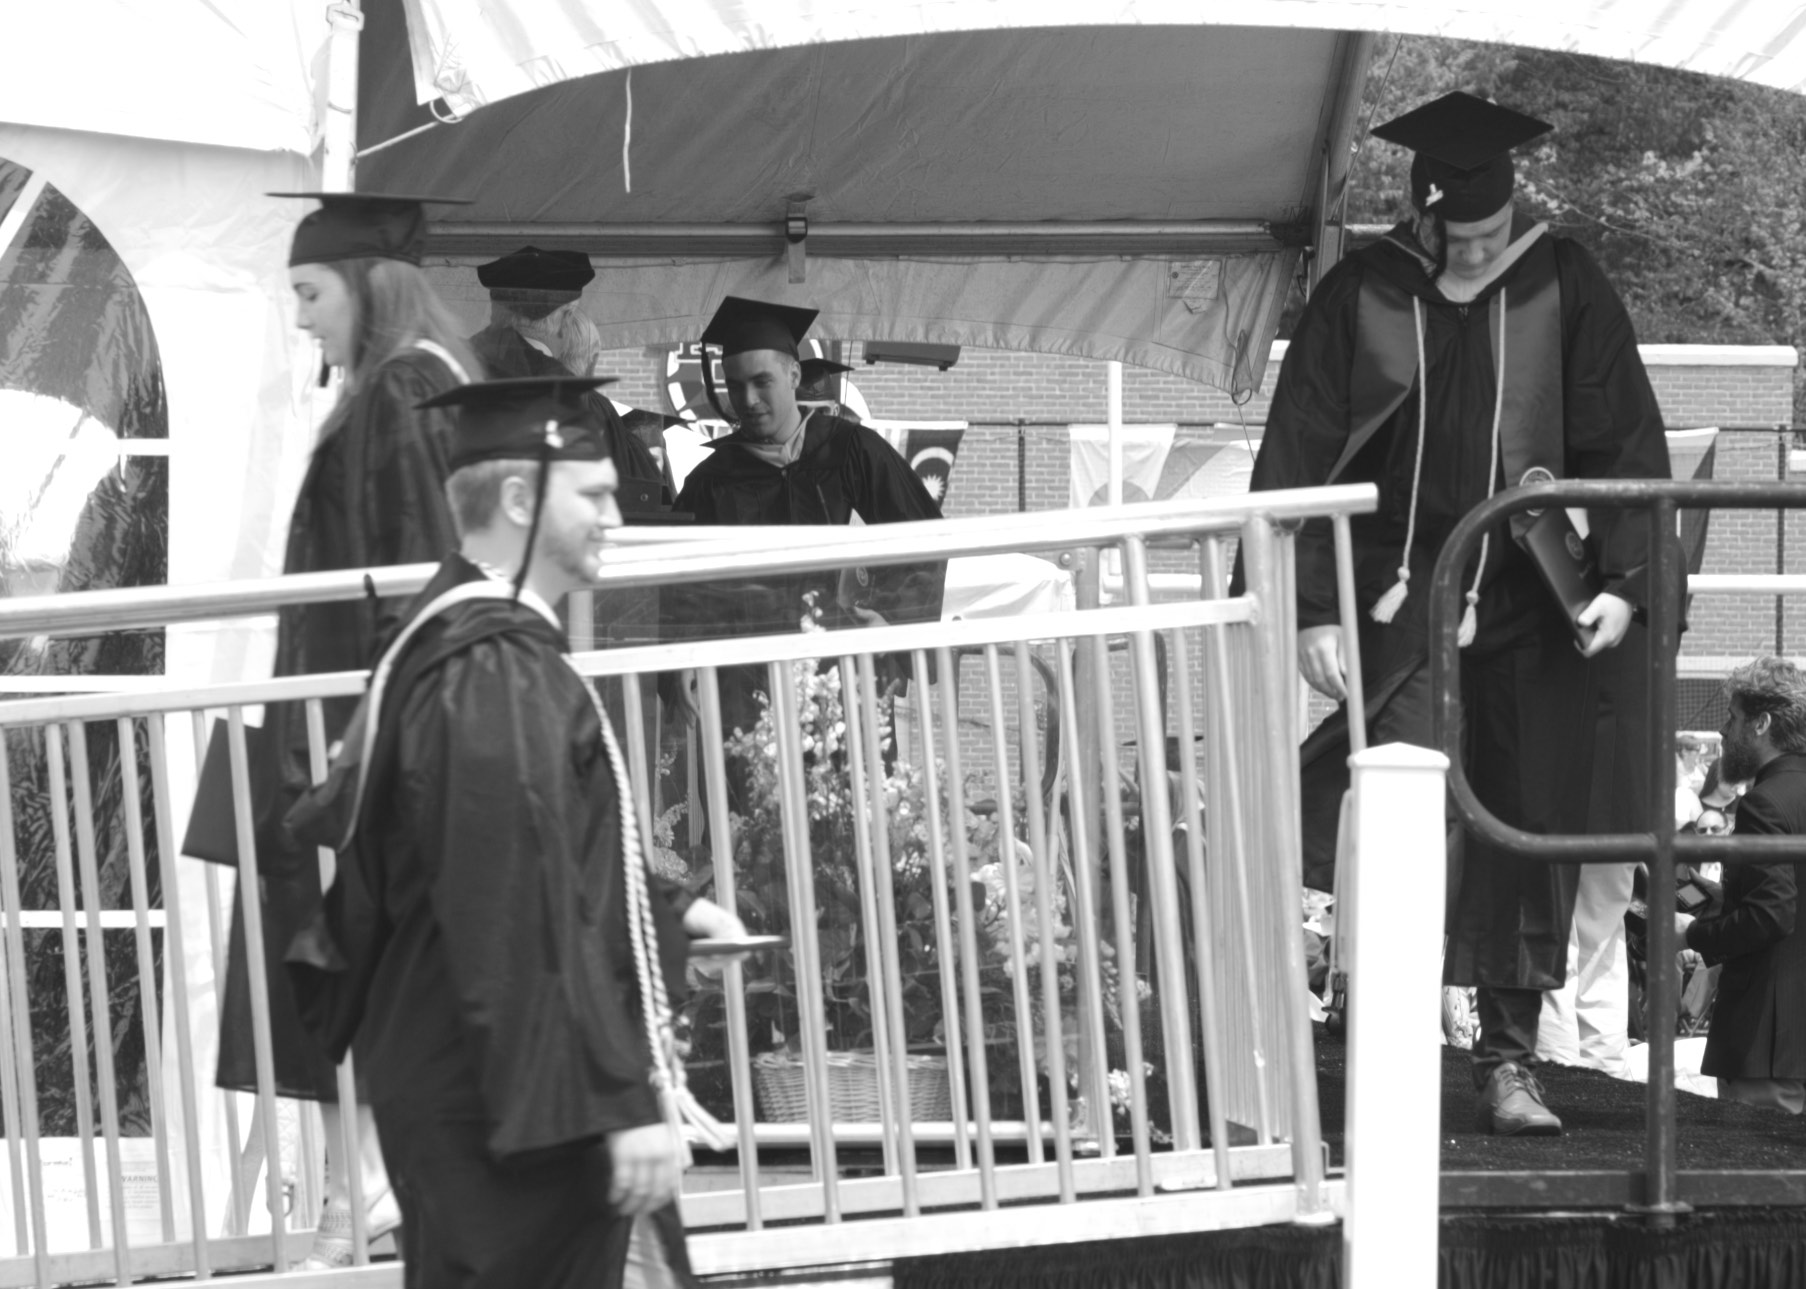 zach_graduation_P5210035.jpg